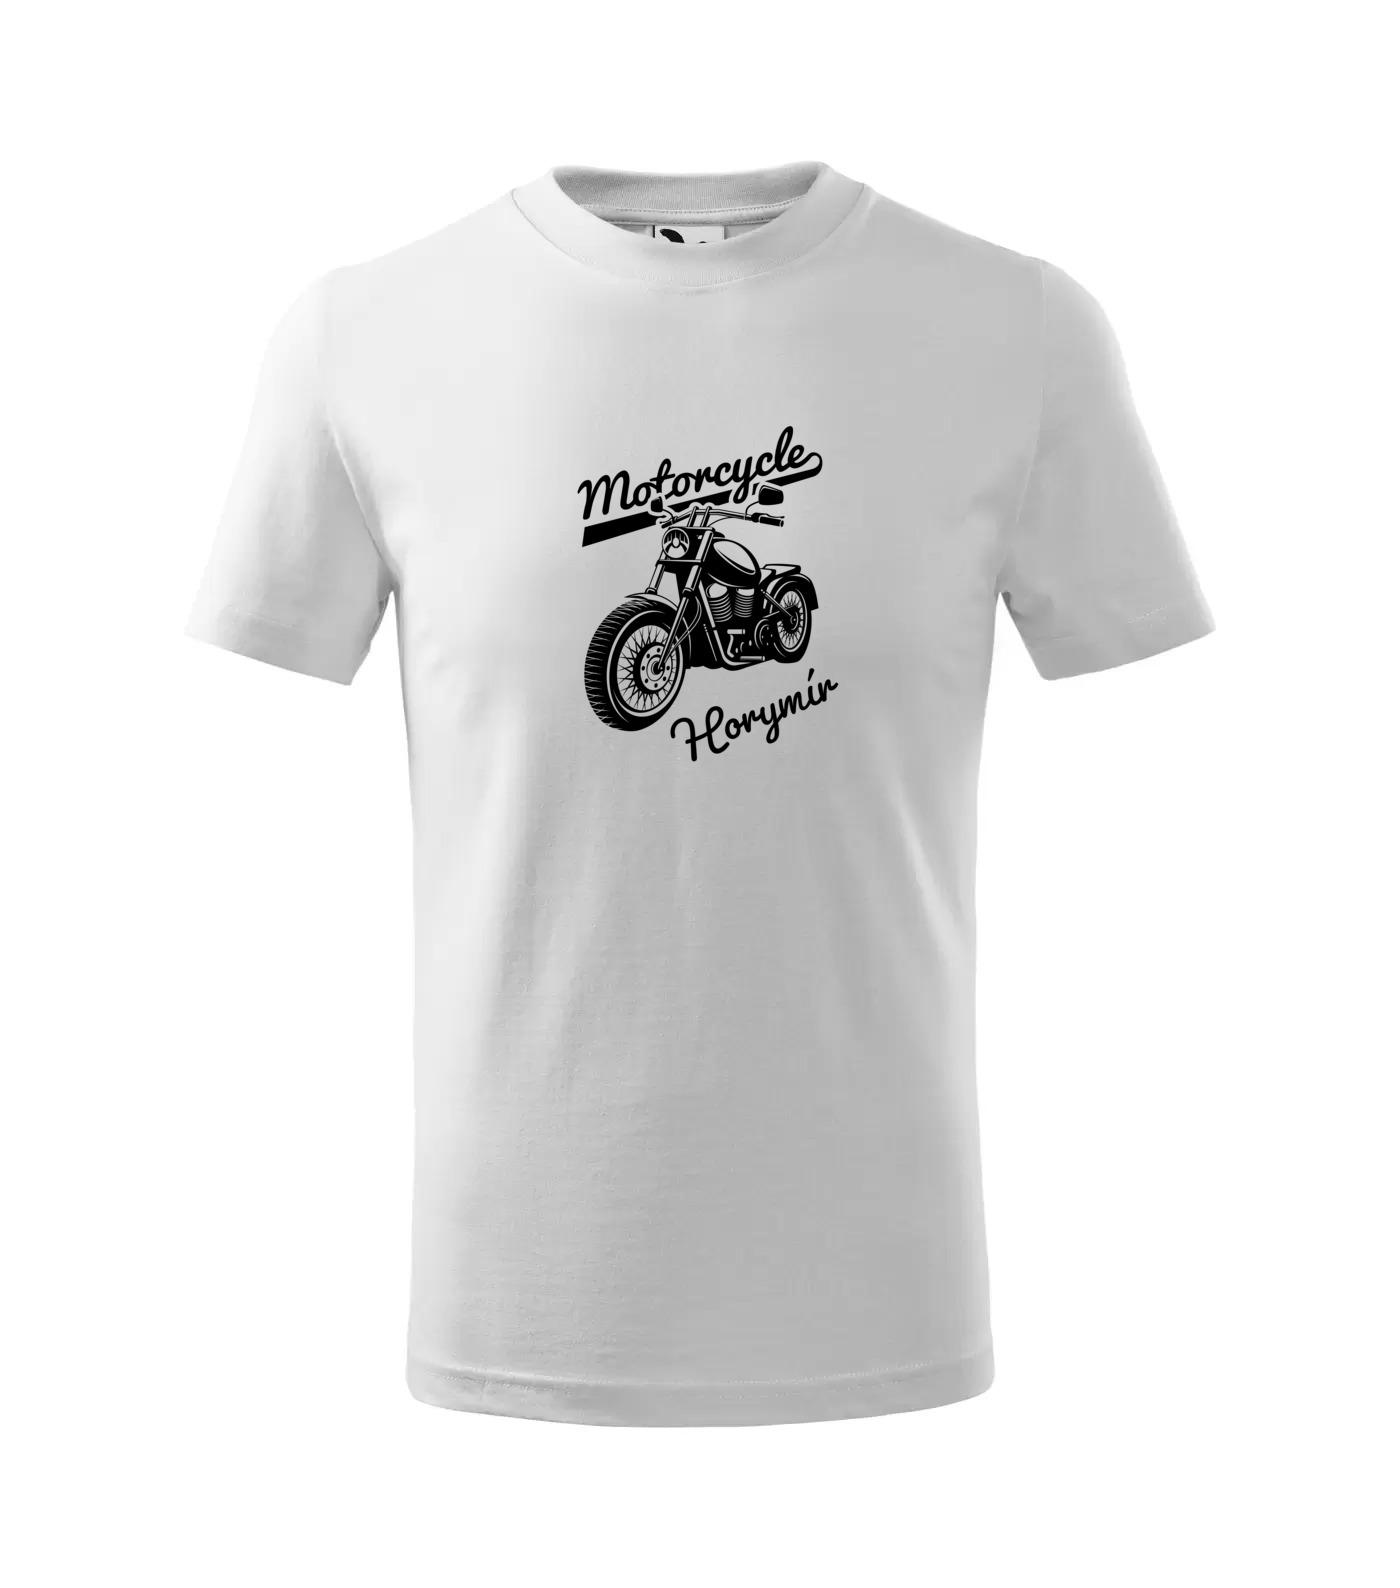 Tričko Motorkář Inverse Horymír